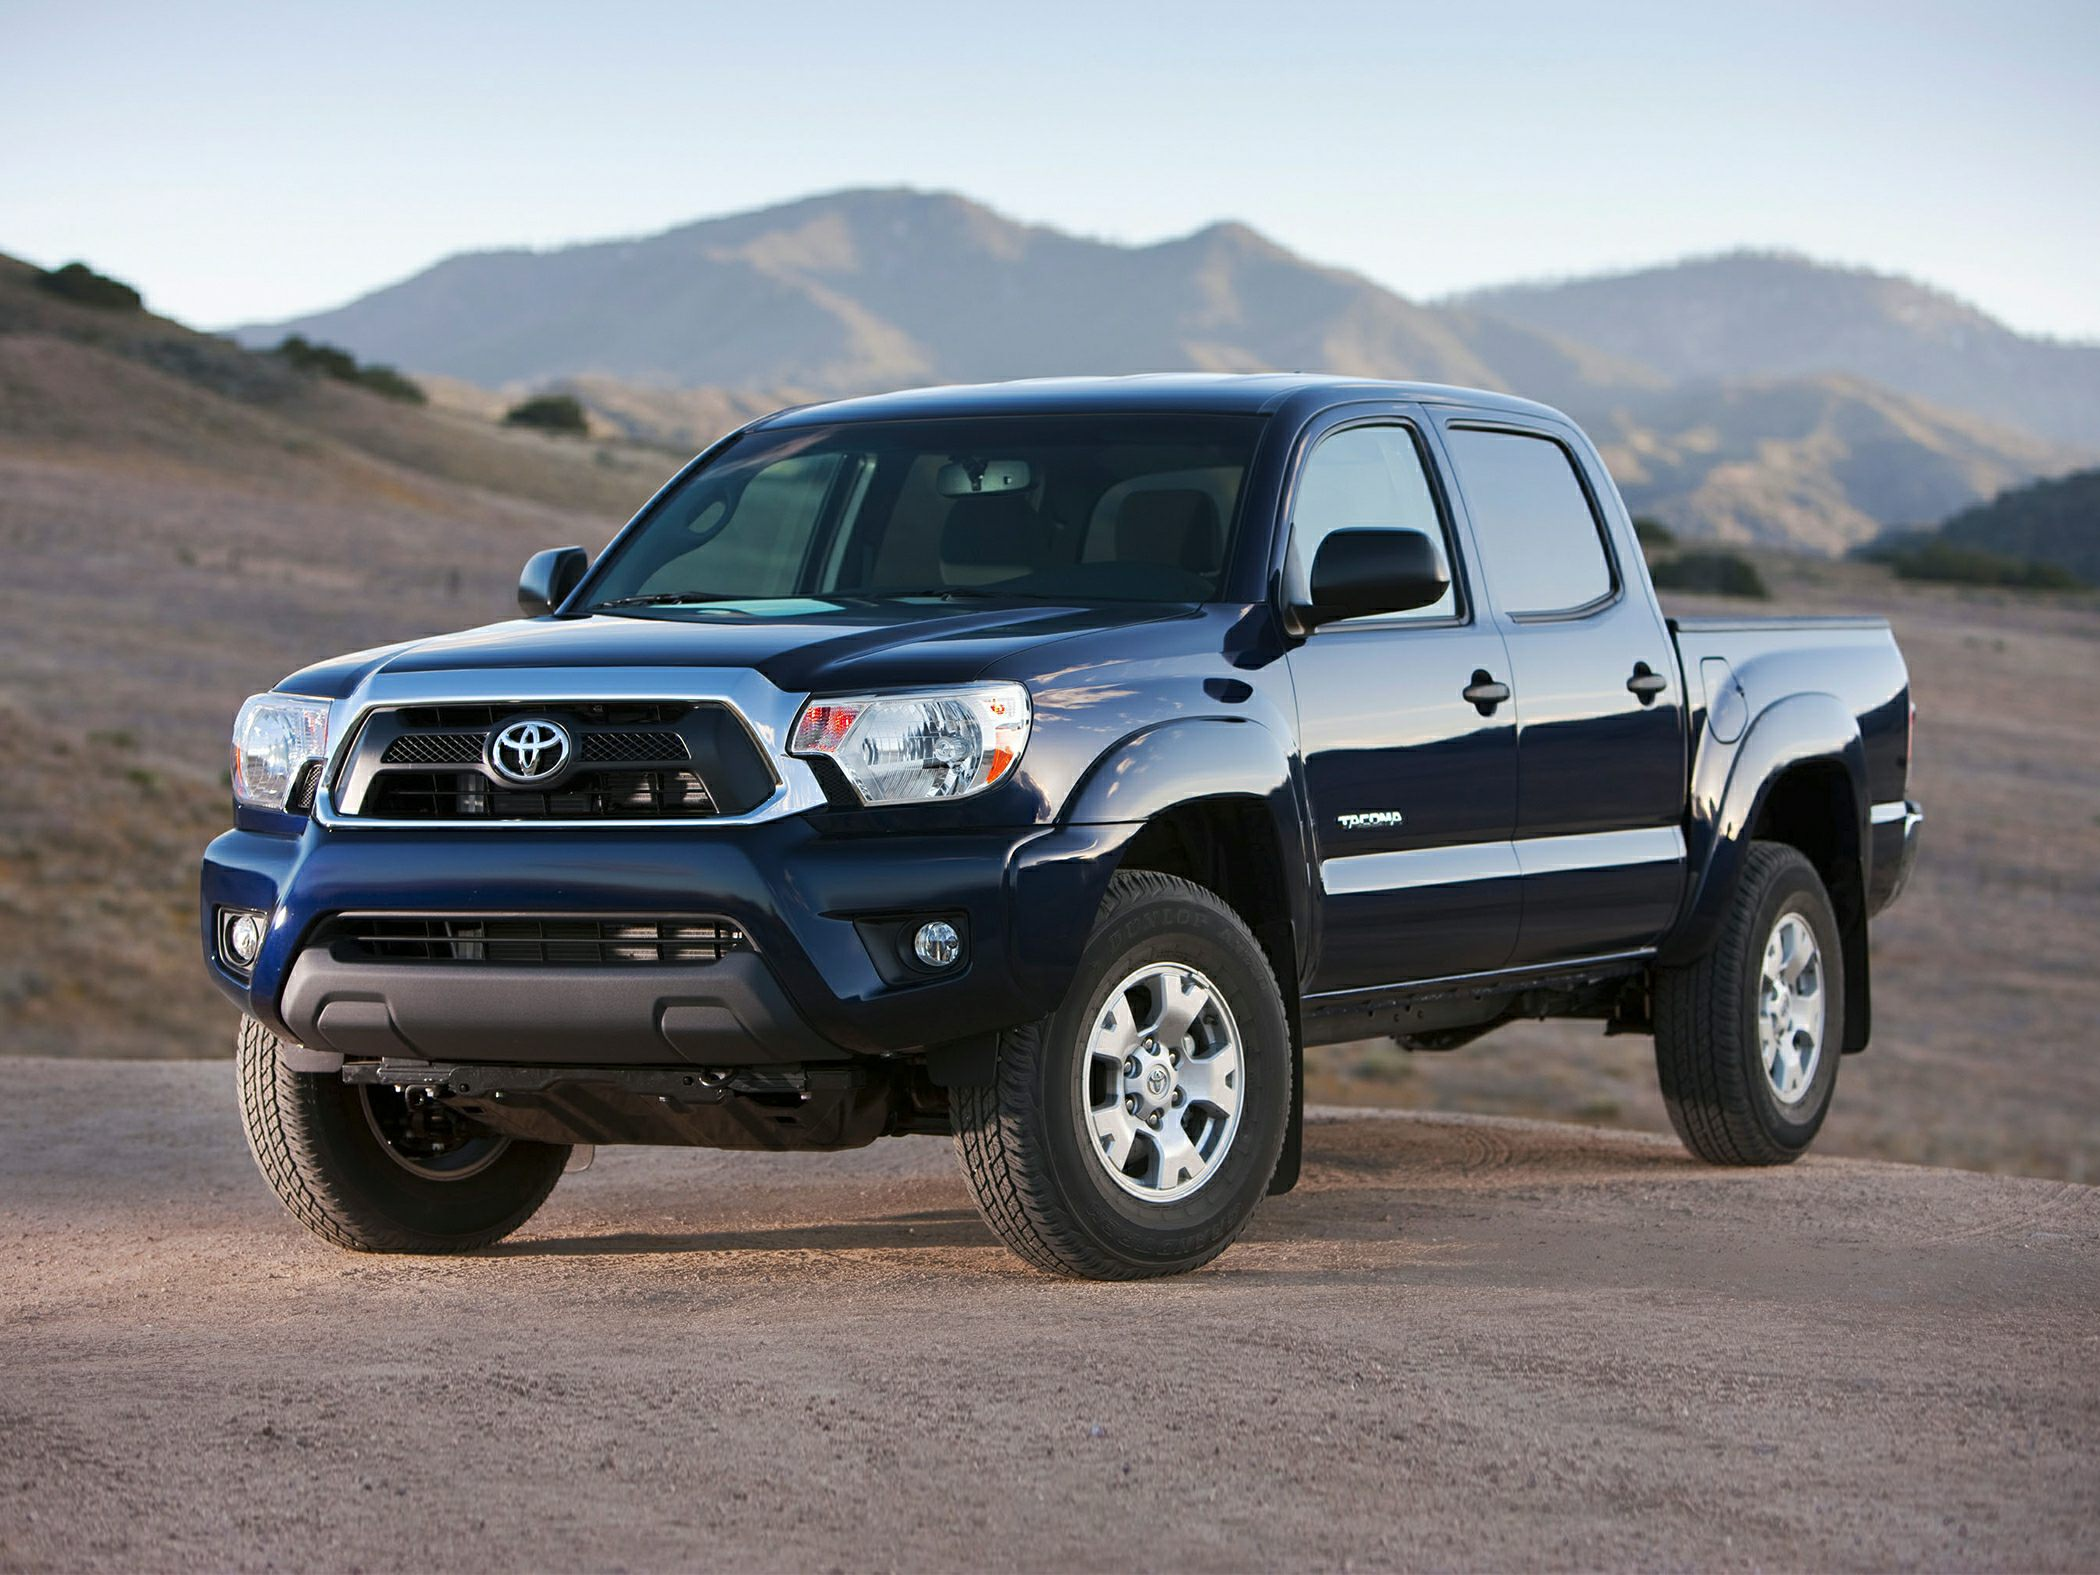 2014 Toyota Tacoma Glam